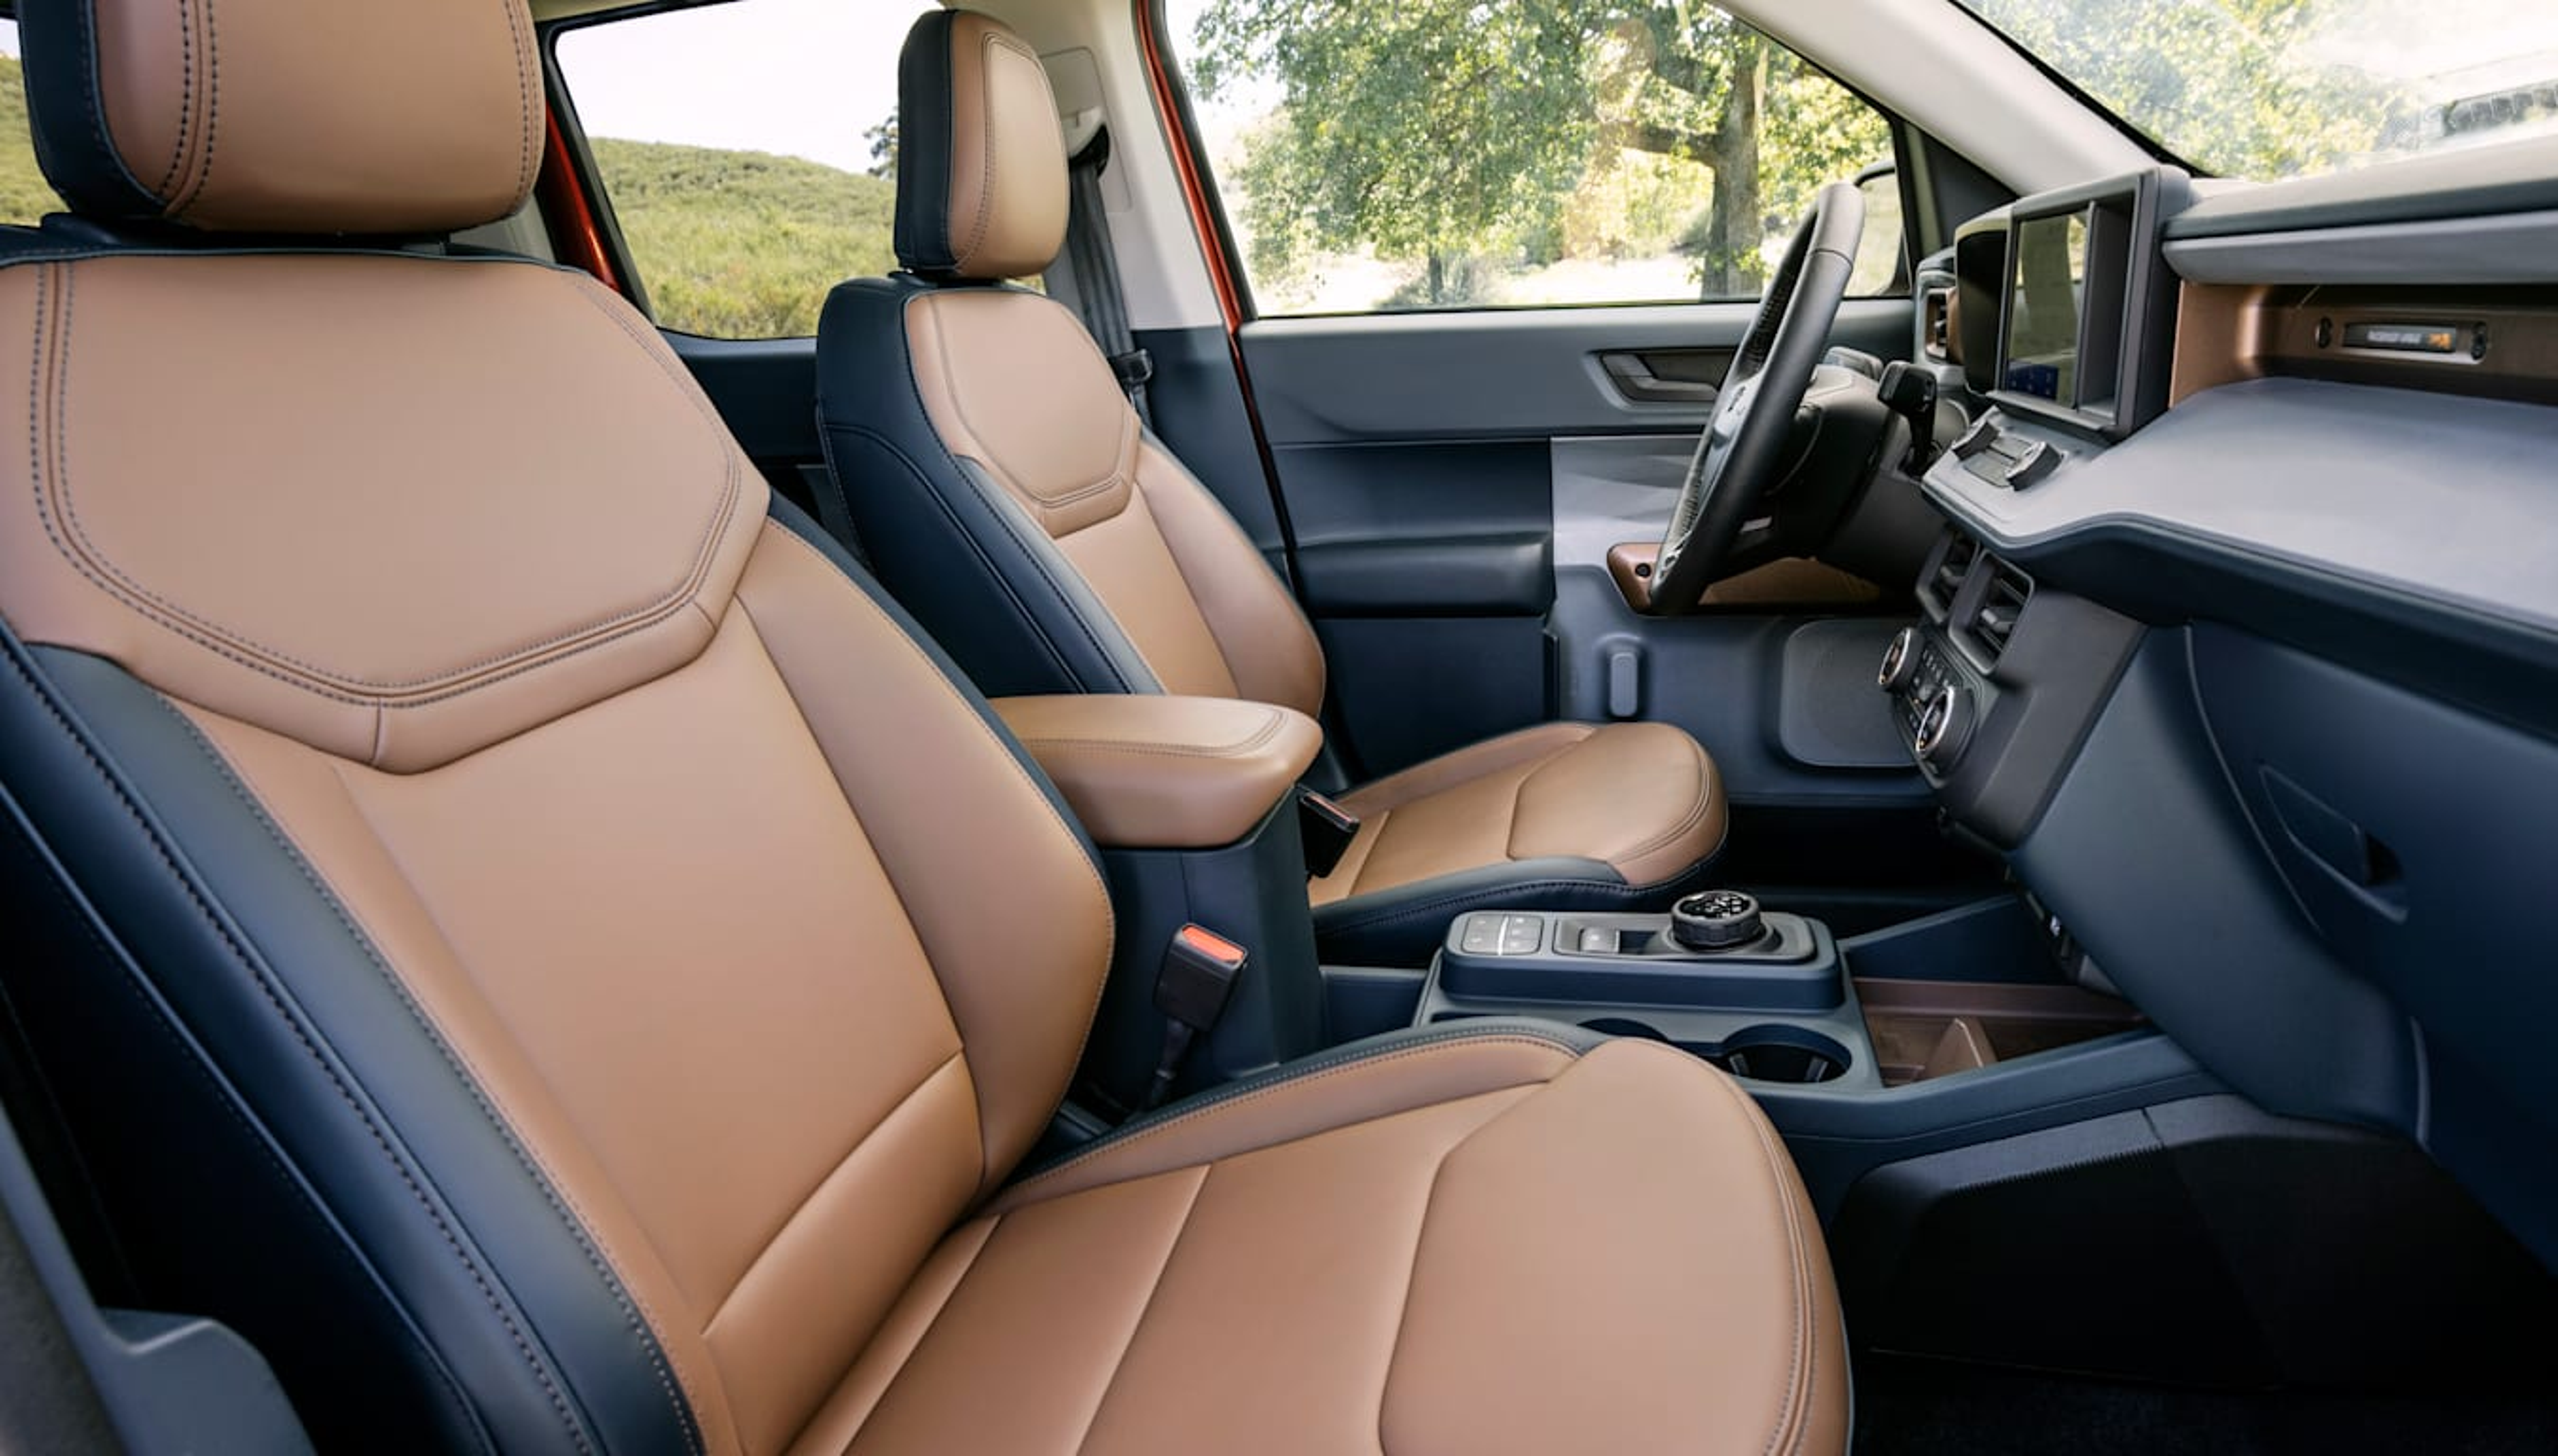 Ford Maverick 2 L Eco Boost AWD Lariat 15